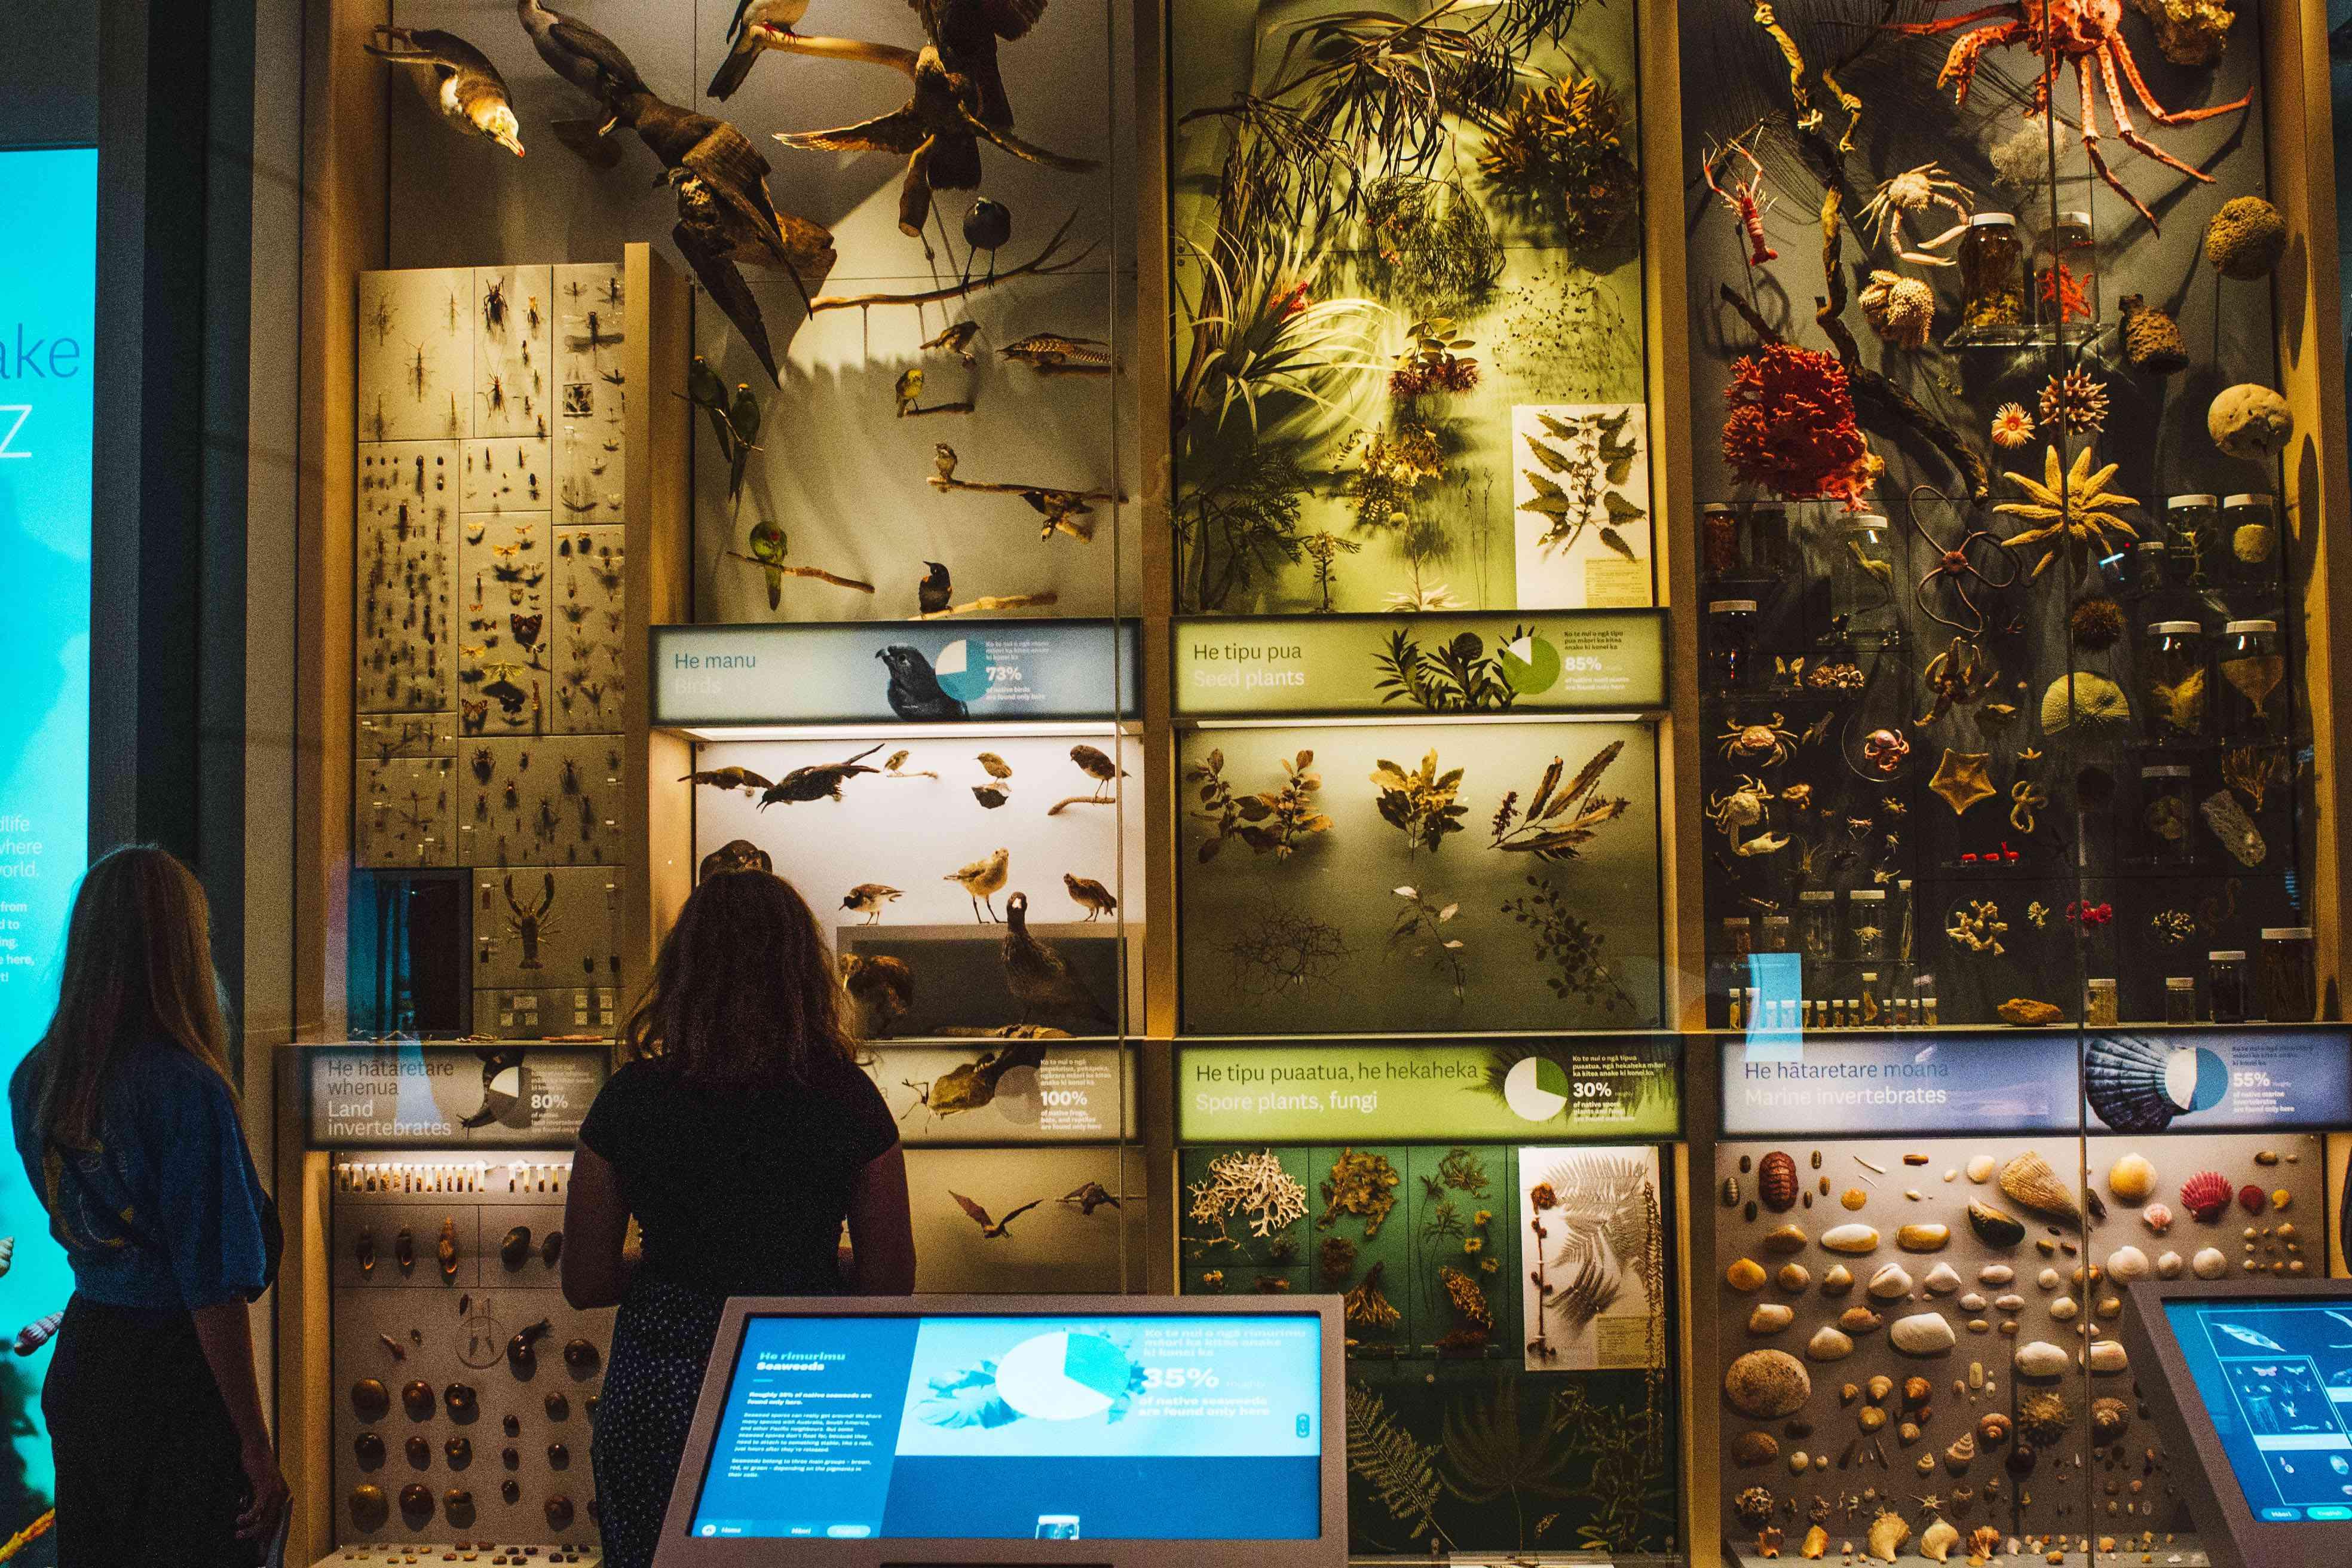 An exhibit on native wildlife at Te Papa museum